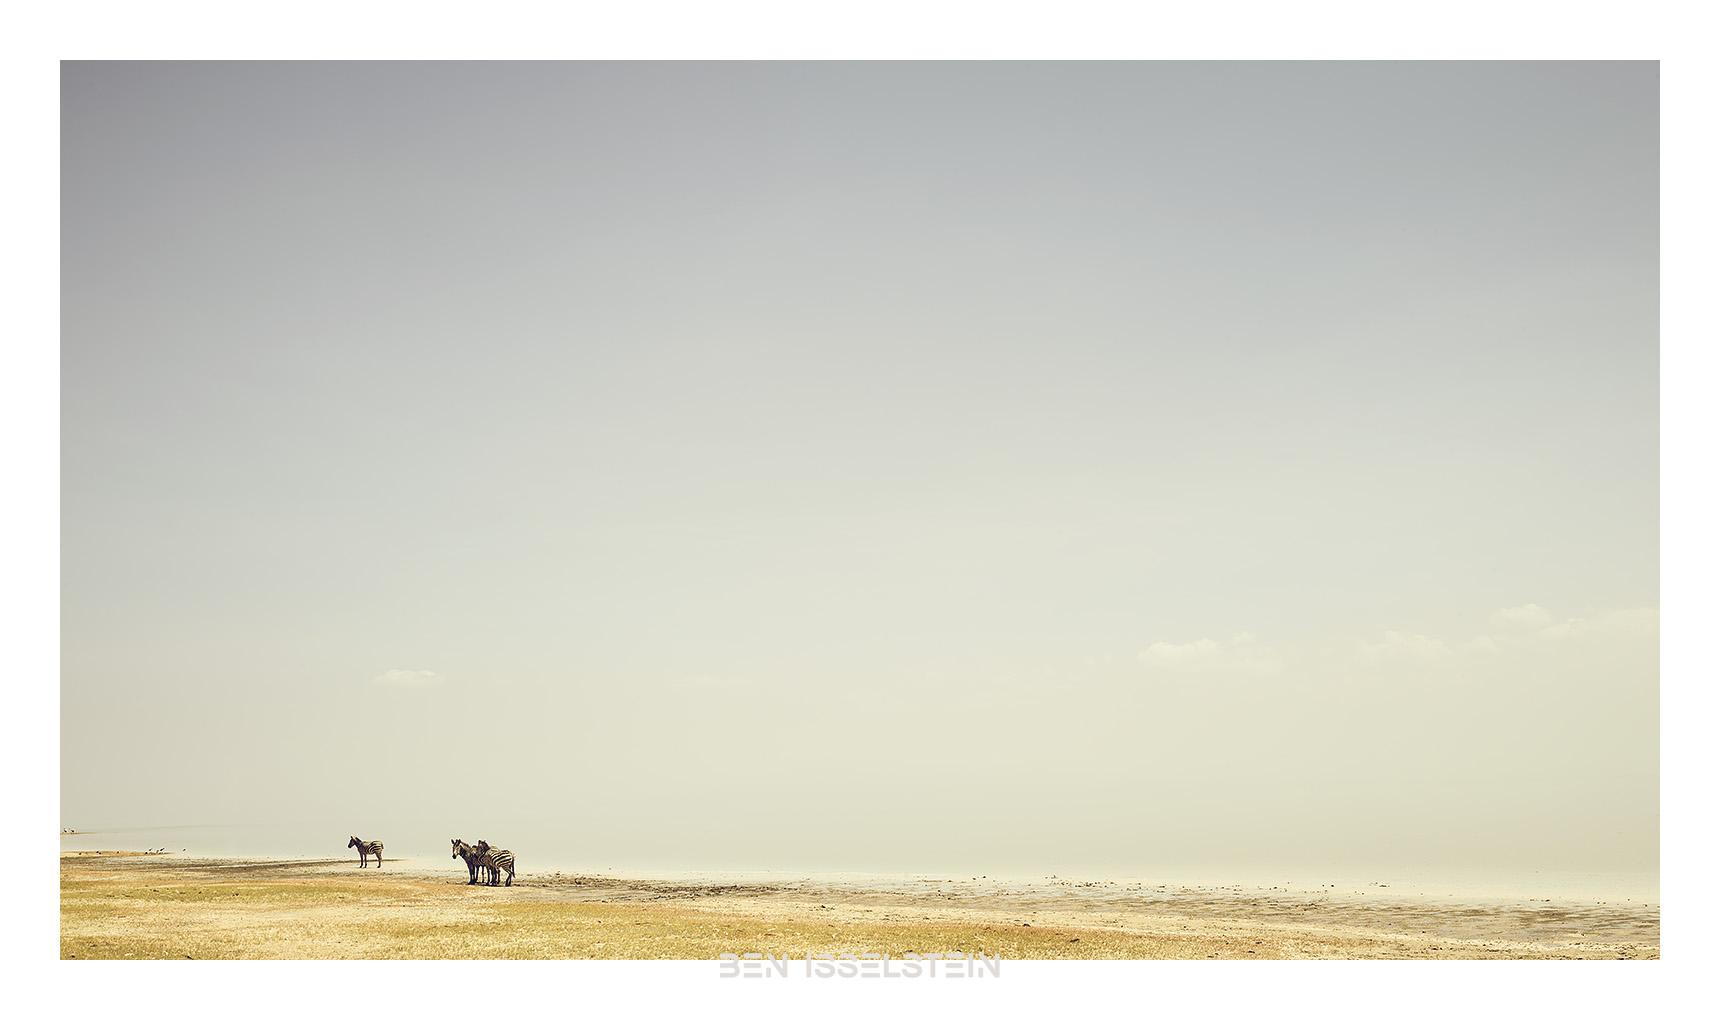 Professionelle Fotografie Aachen Zebras Tansania